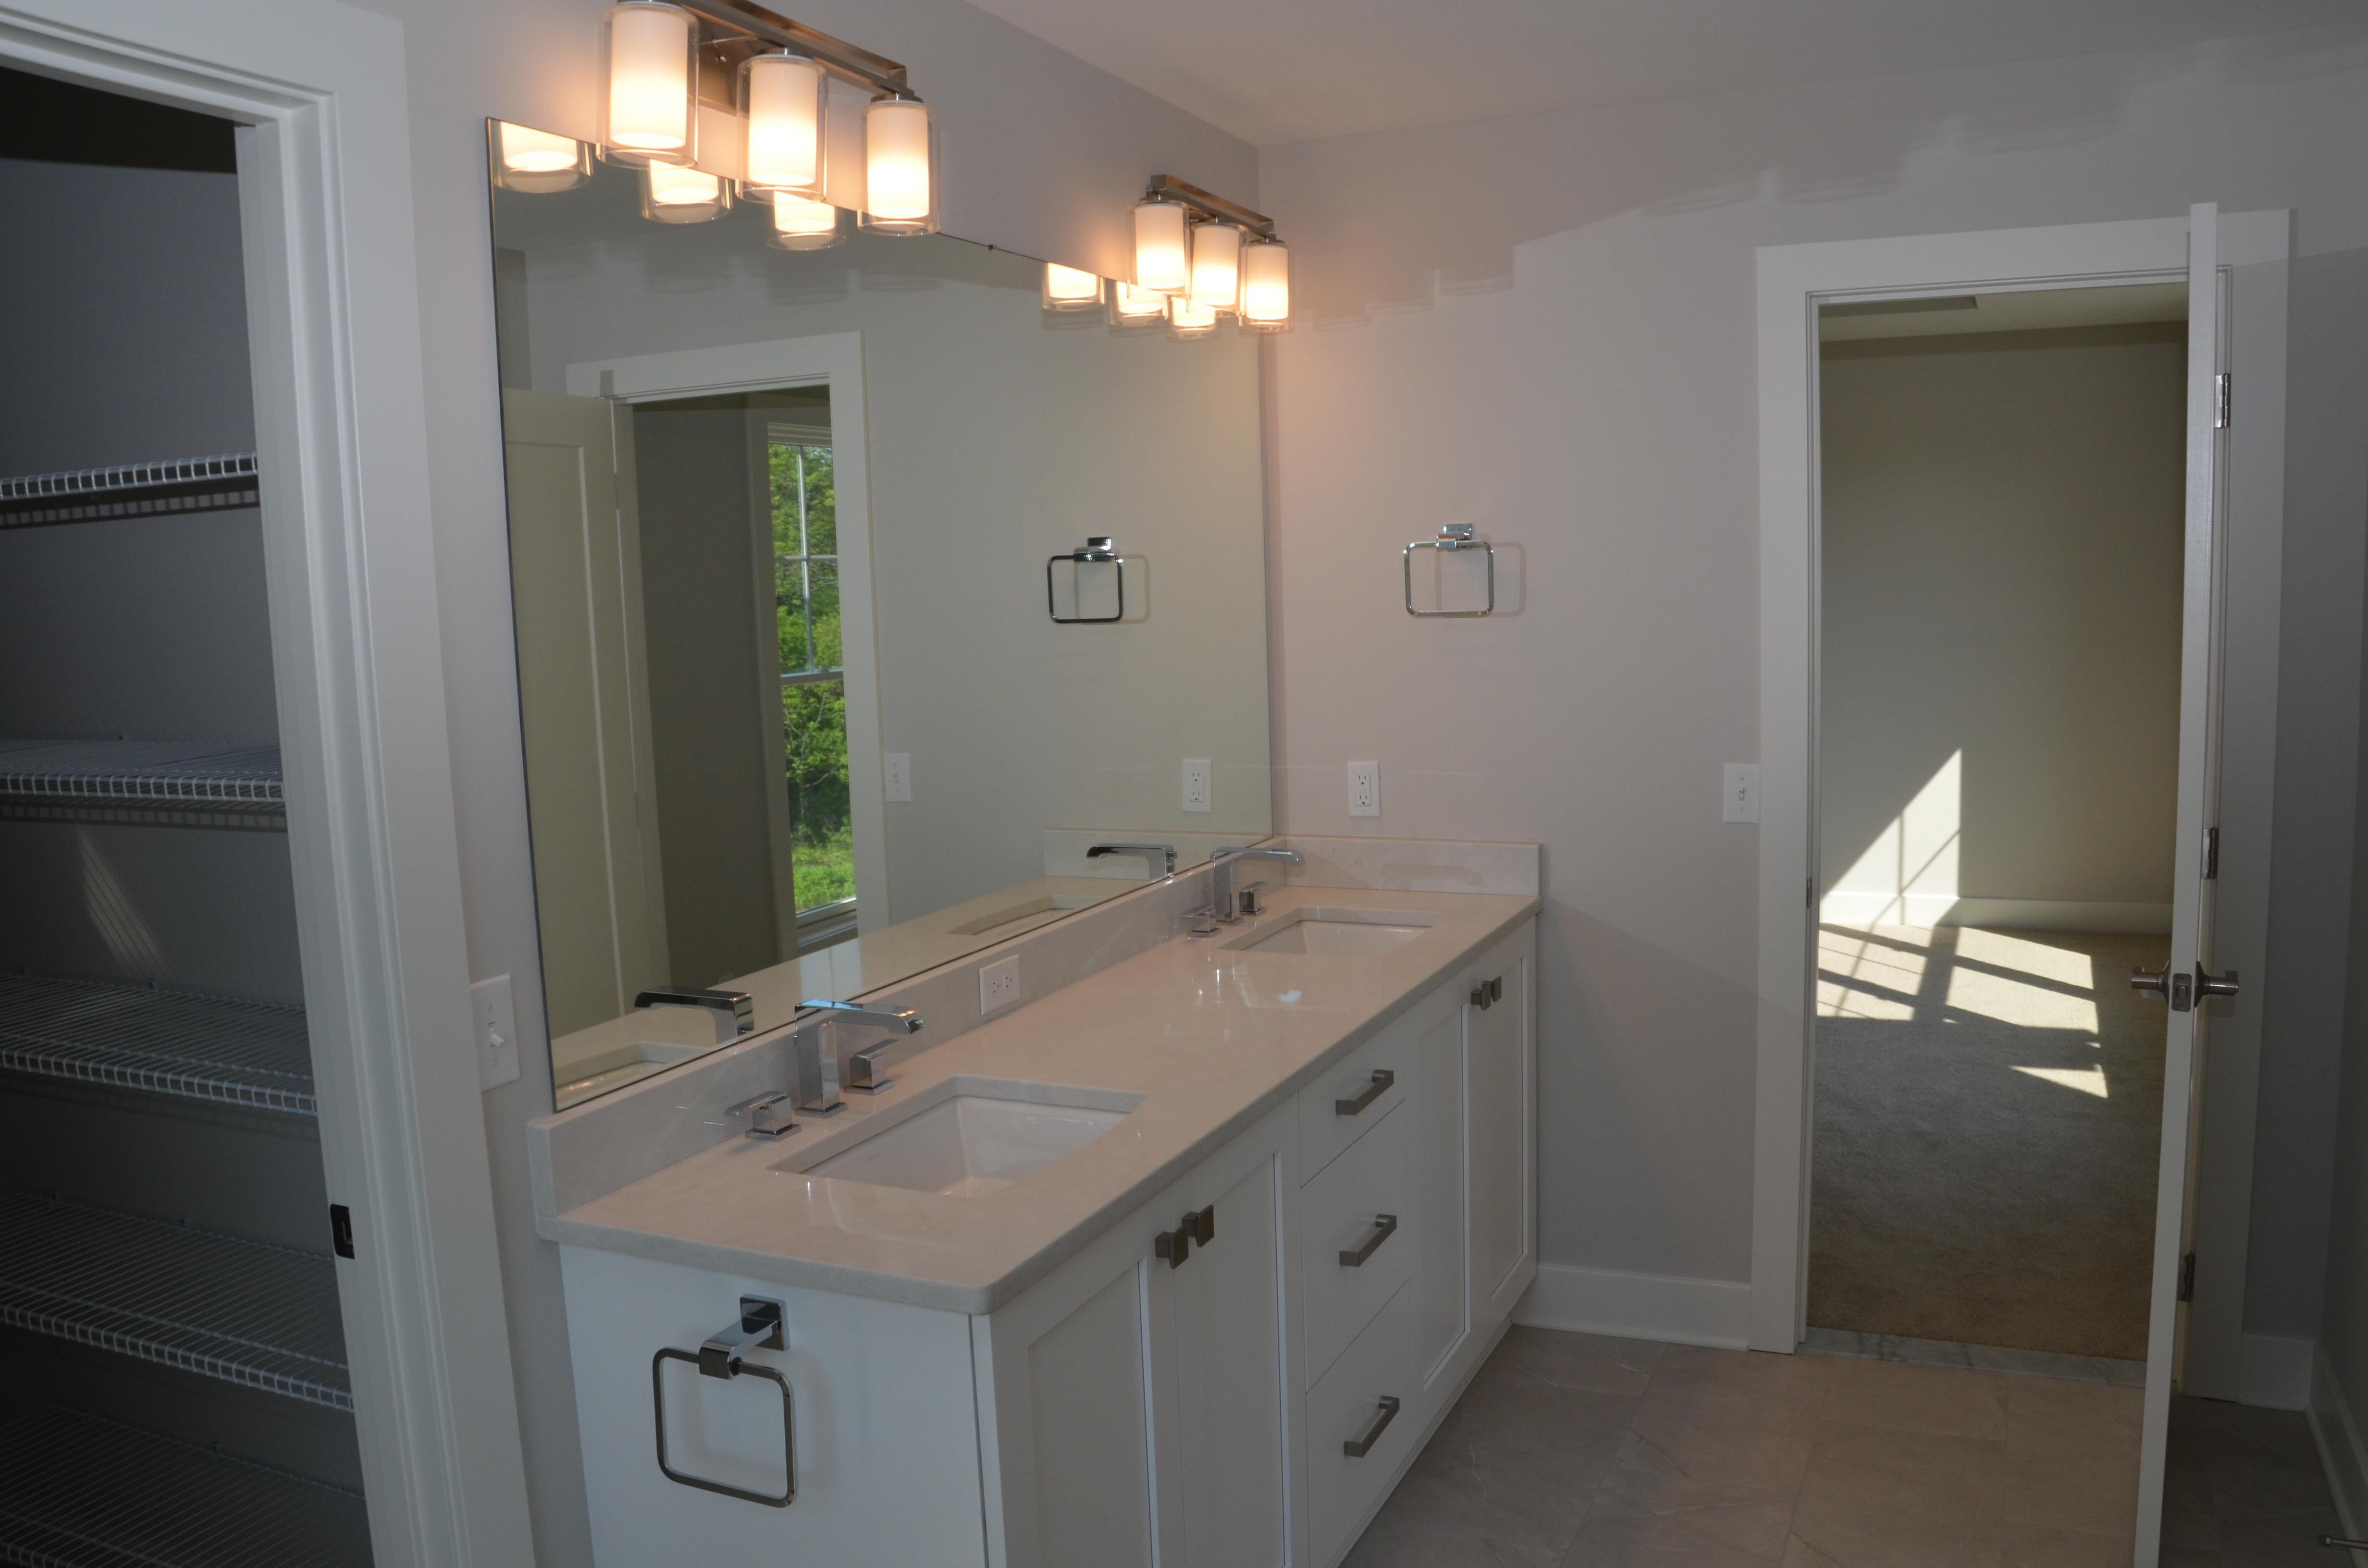 #14 Ravenna Crescent (Lot 28) Bathroom